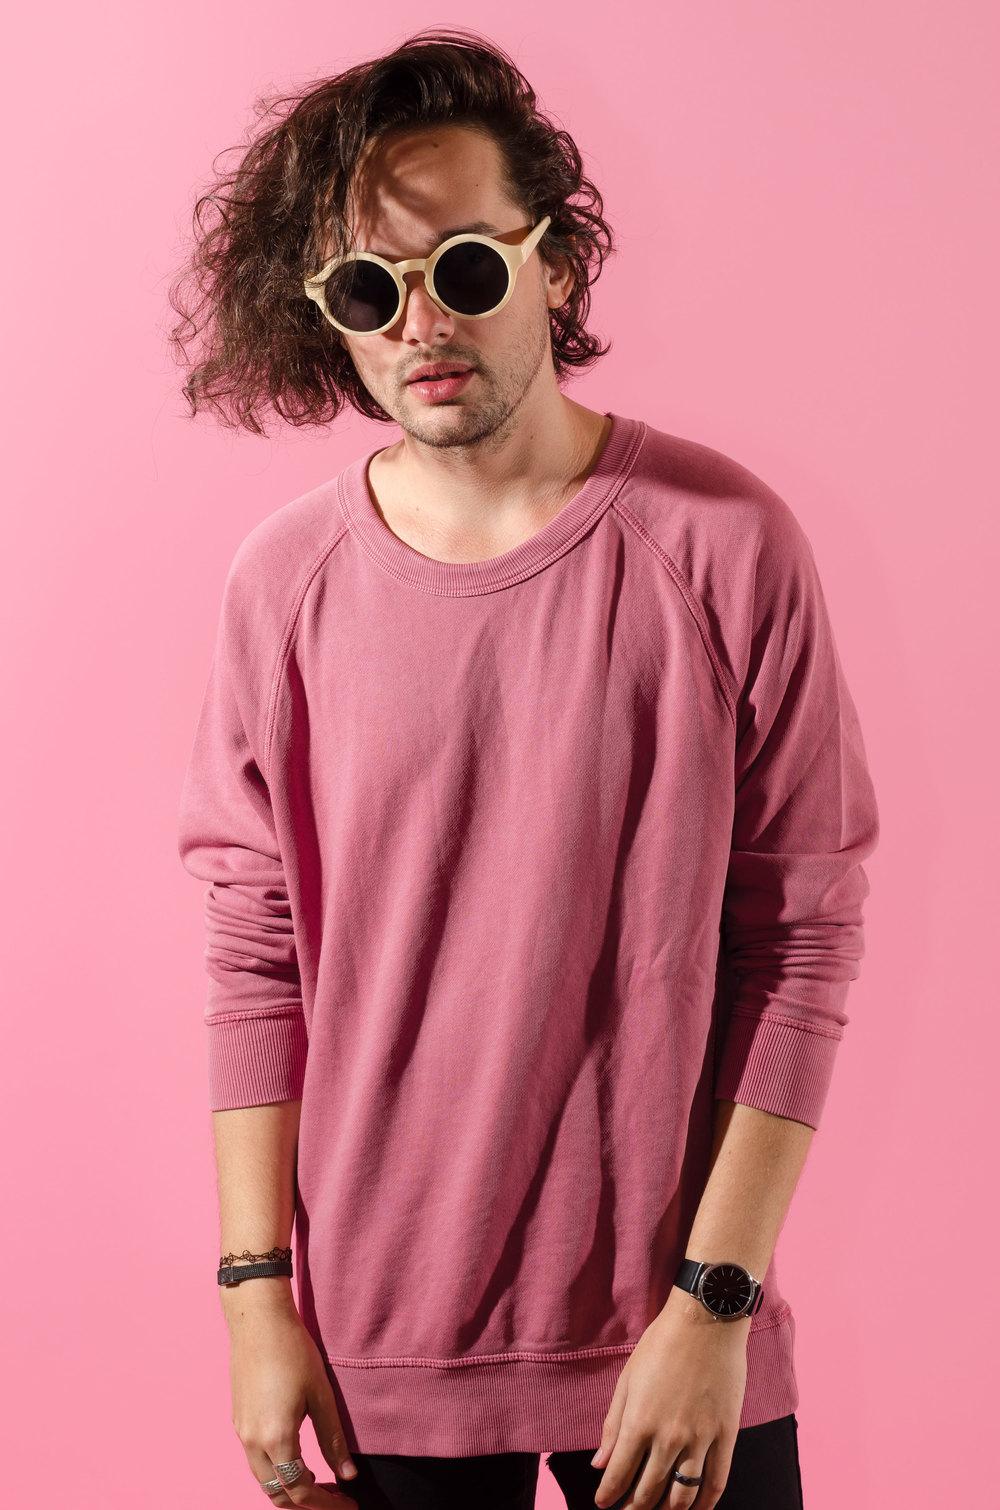 casenruiz-max-pink-2.jpg